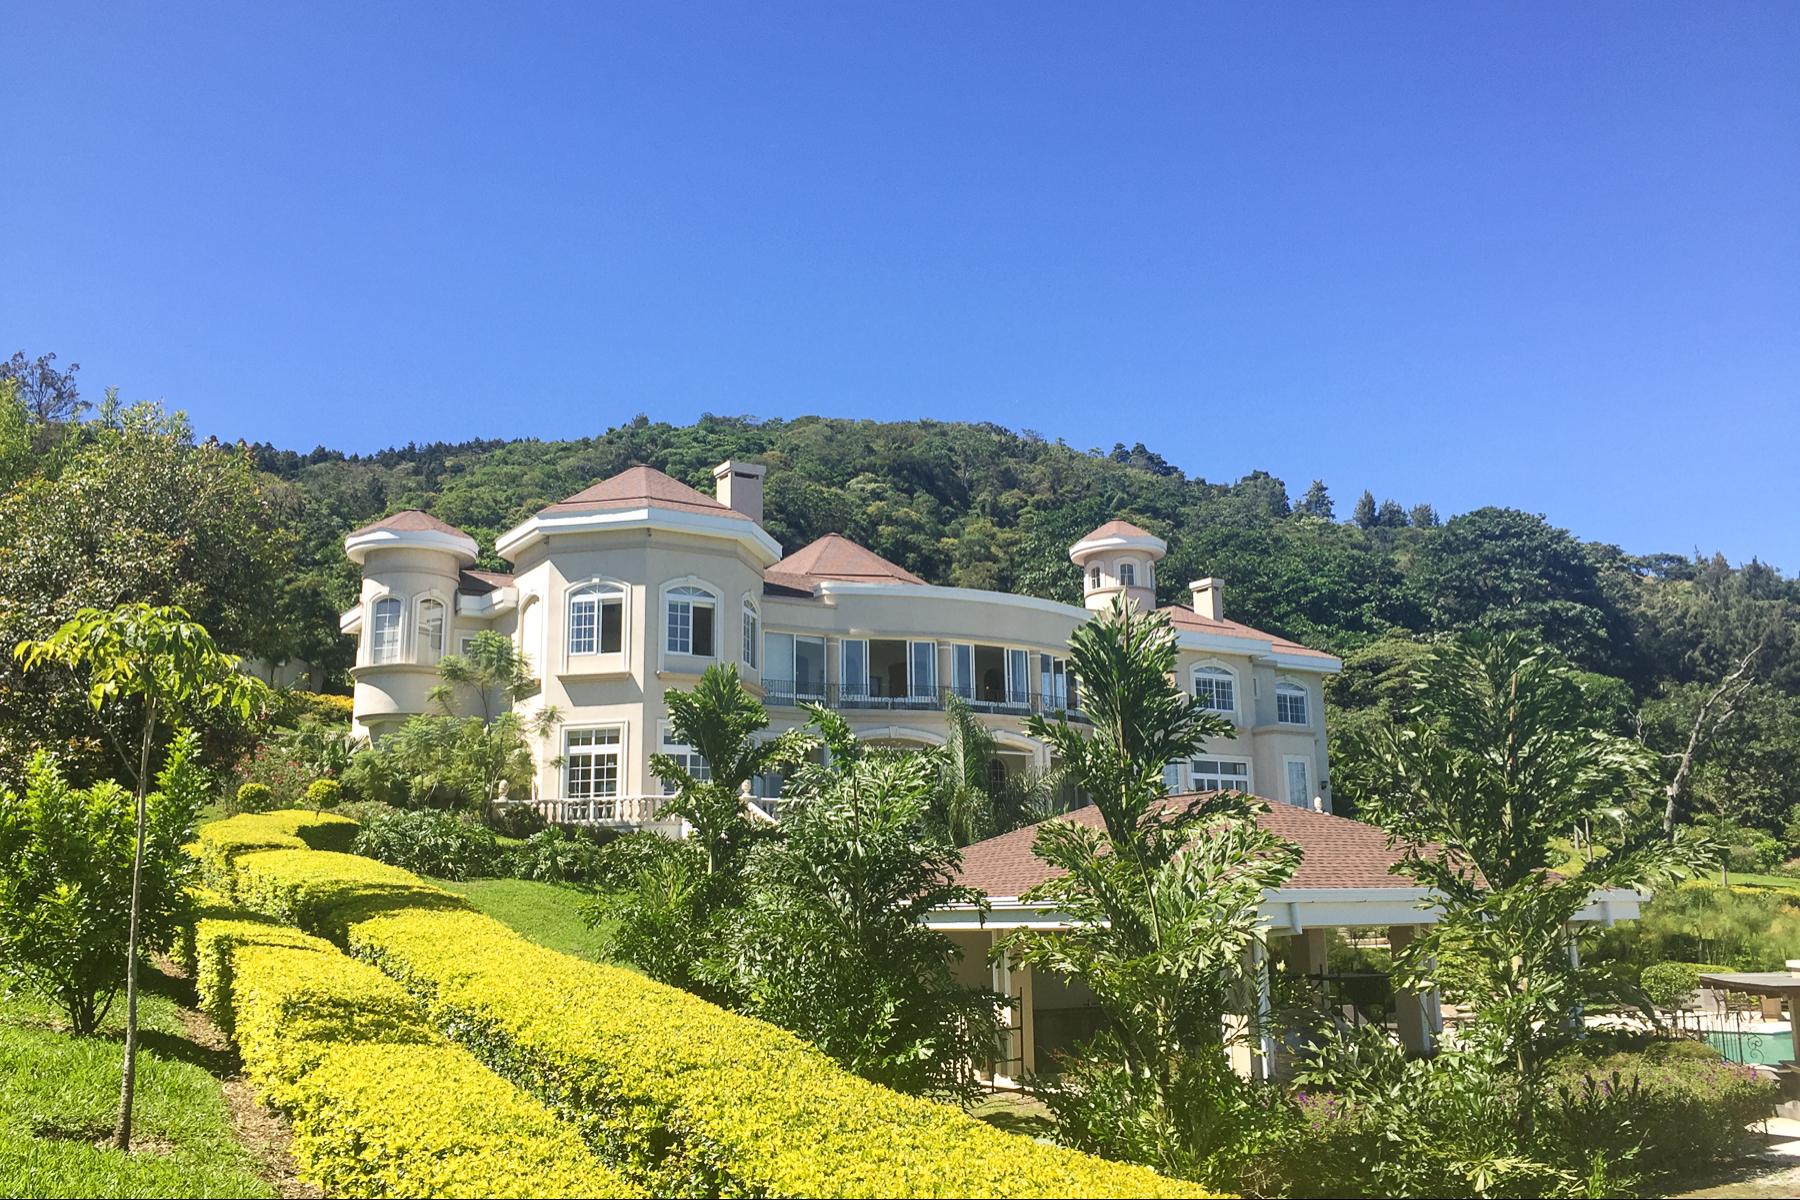 Single Family Homes for Sale at Escazú Mountain Mansion Escazu, San Jose Costa Rica